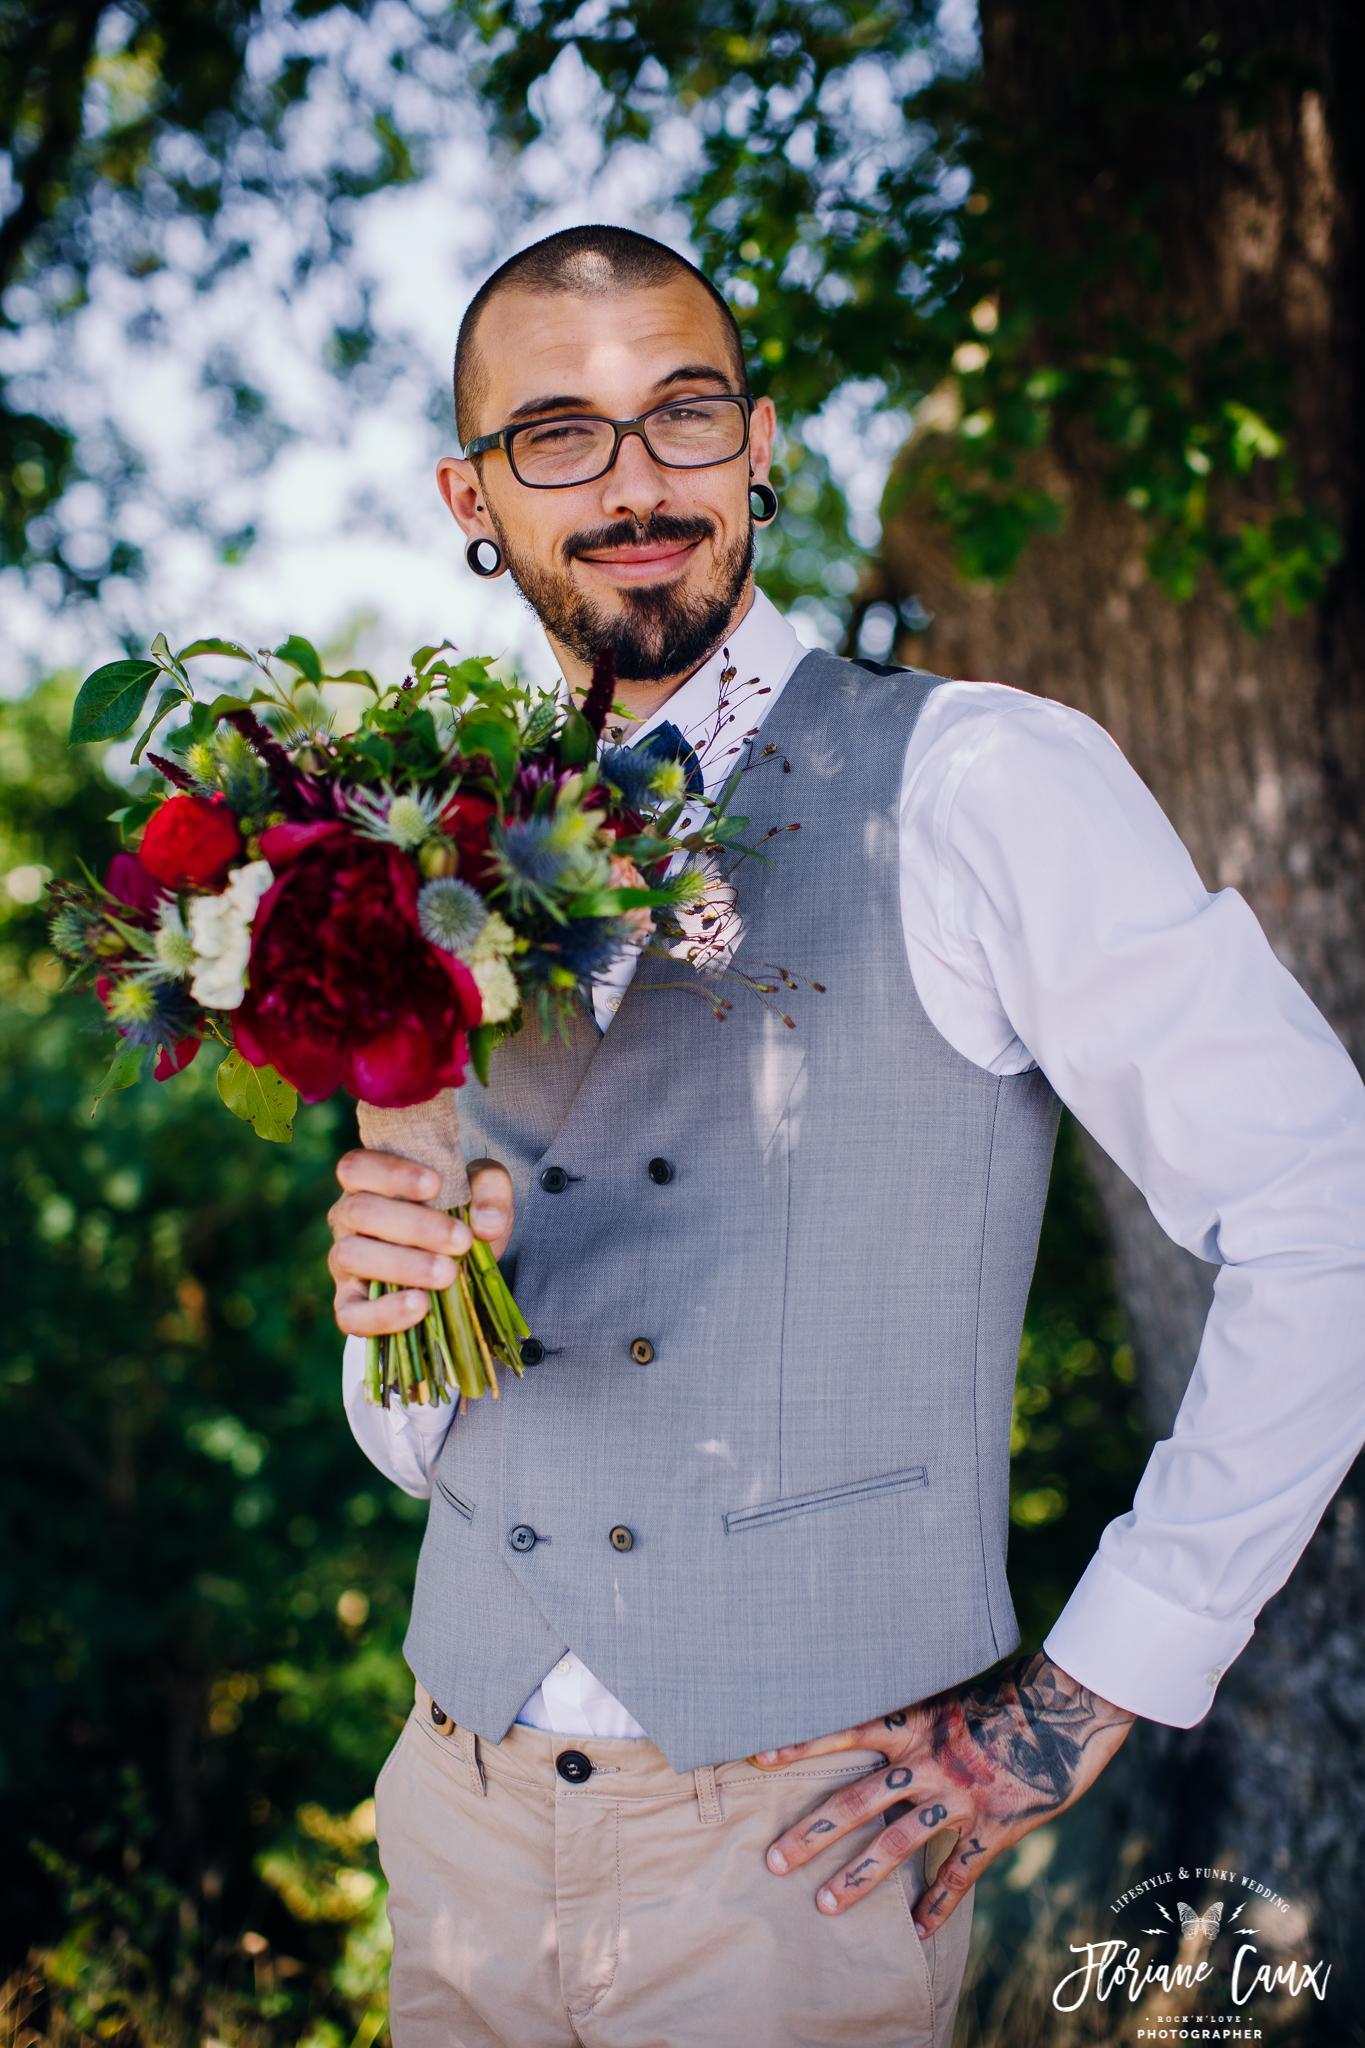 photographe-mariage-toulouse-rocknroll-maries-tatoues-floriane-caux-23